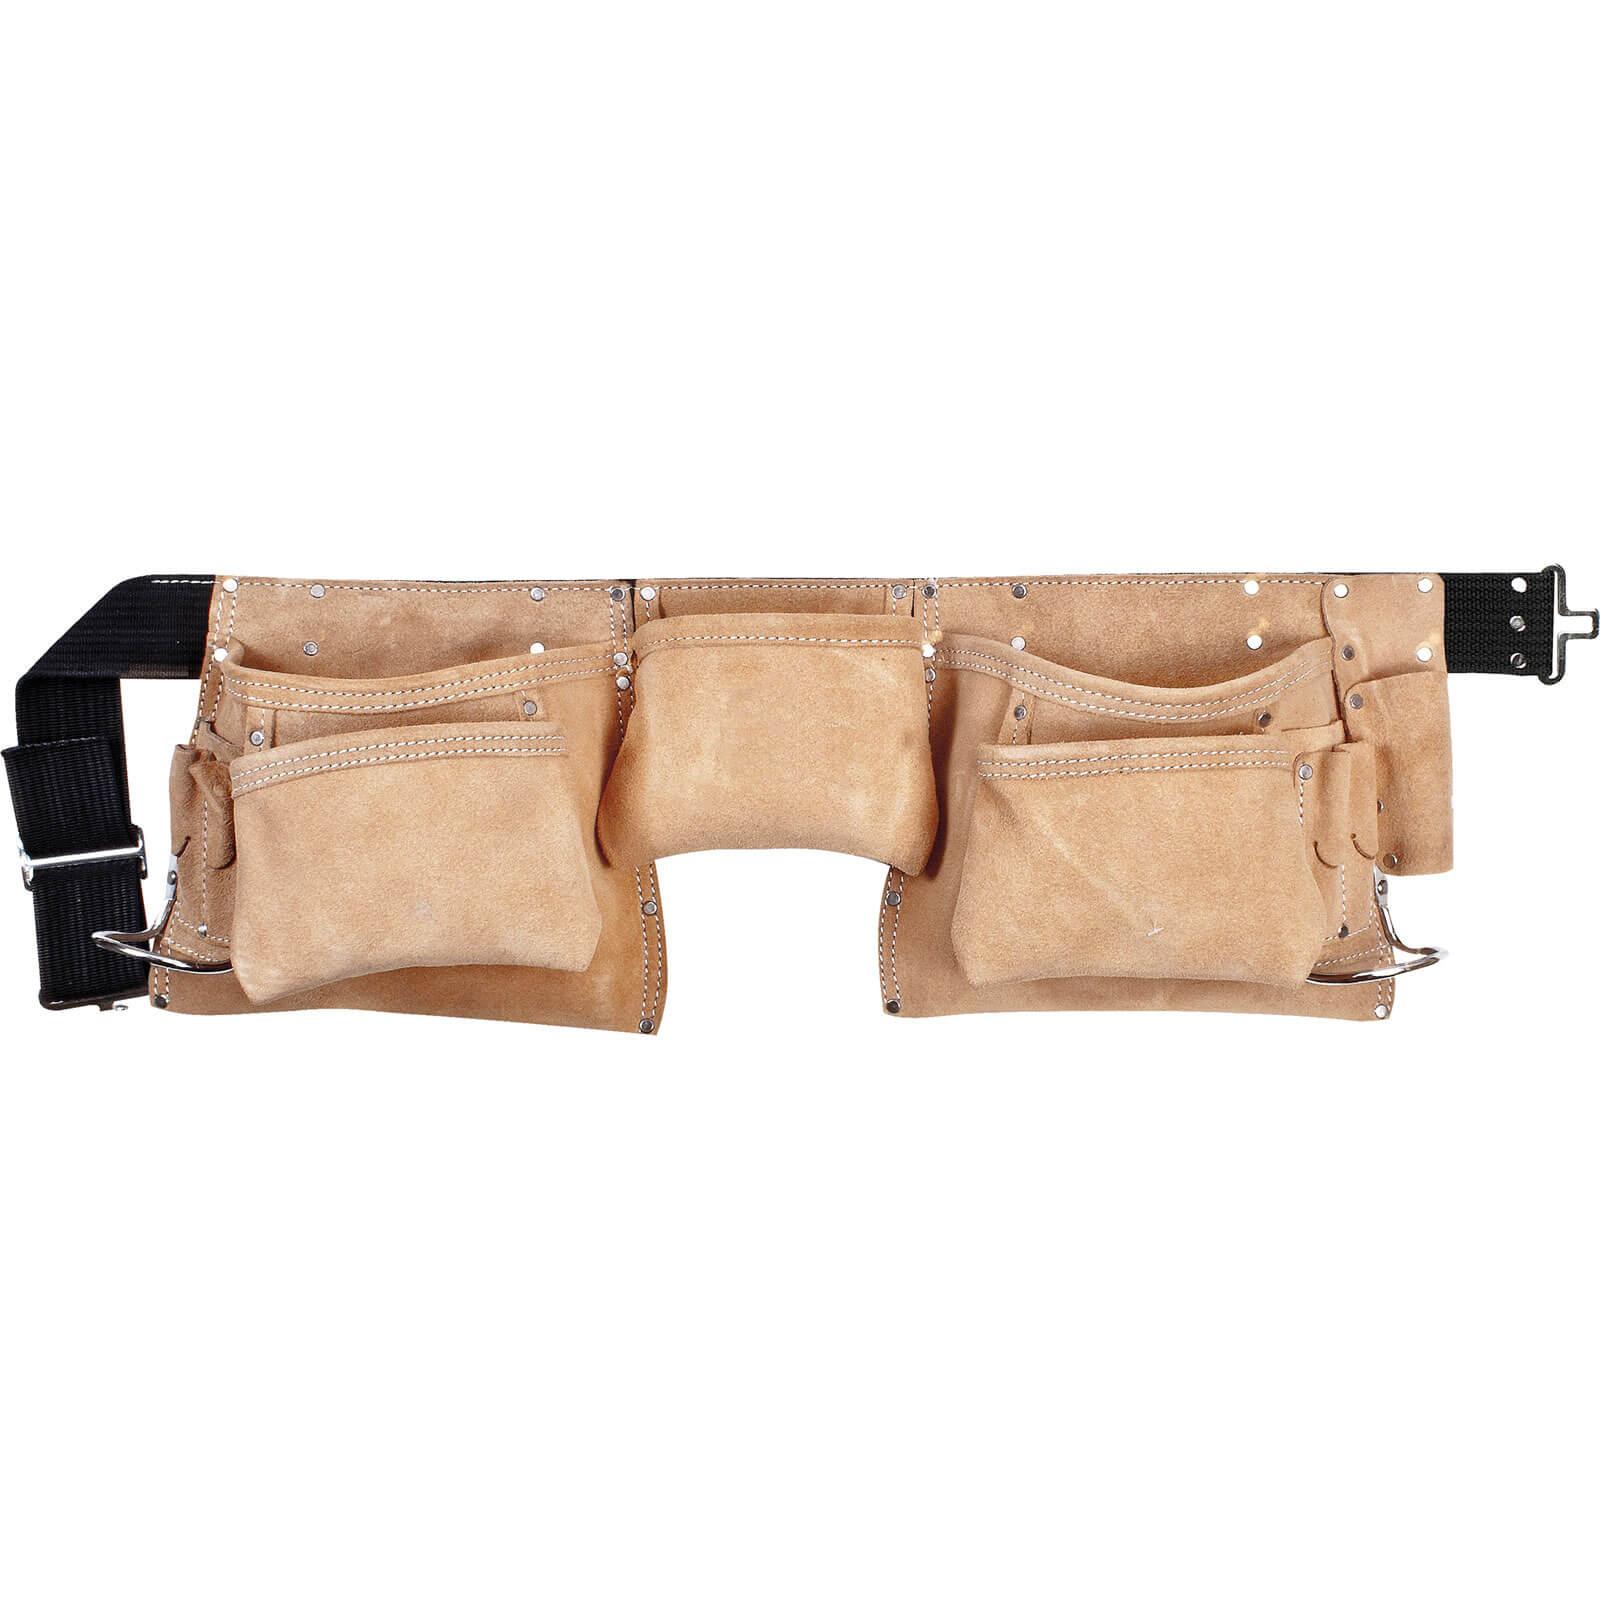 Kunys 11 Pocket Carpenters Leather Tool Belt Fits